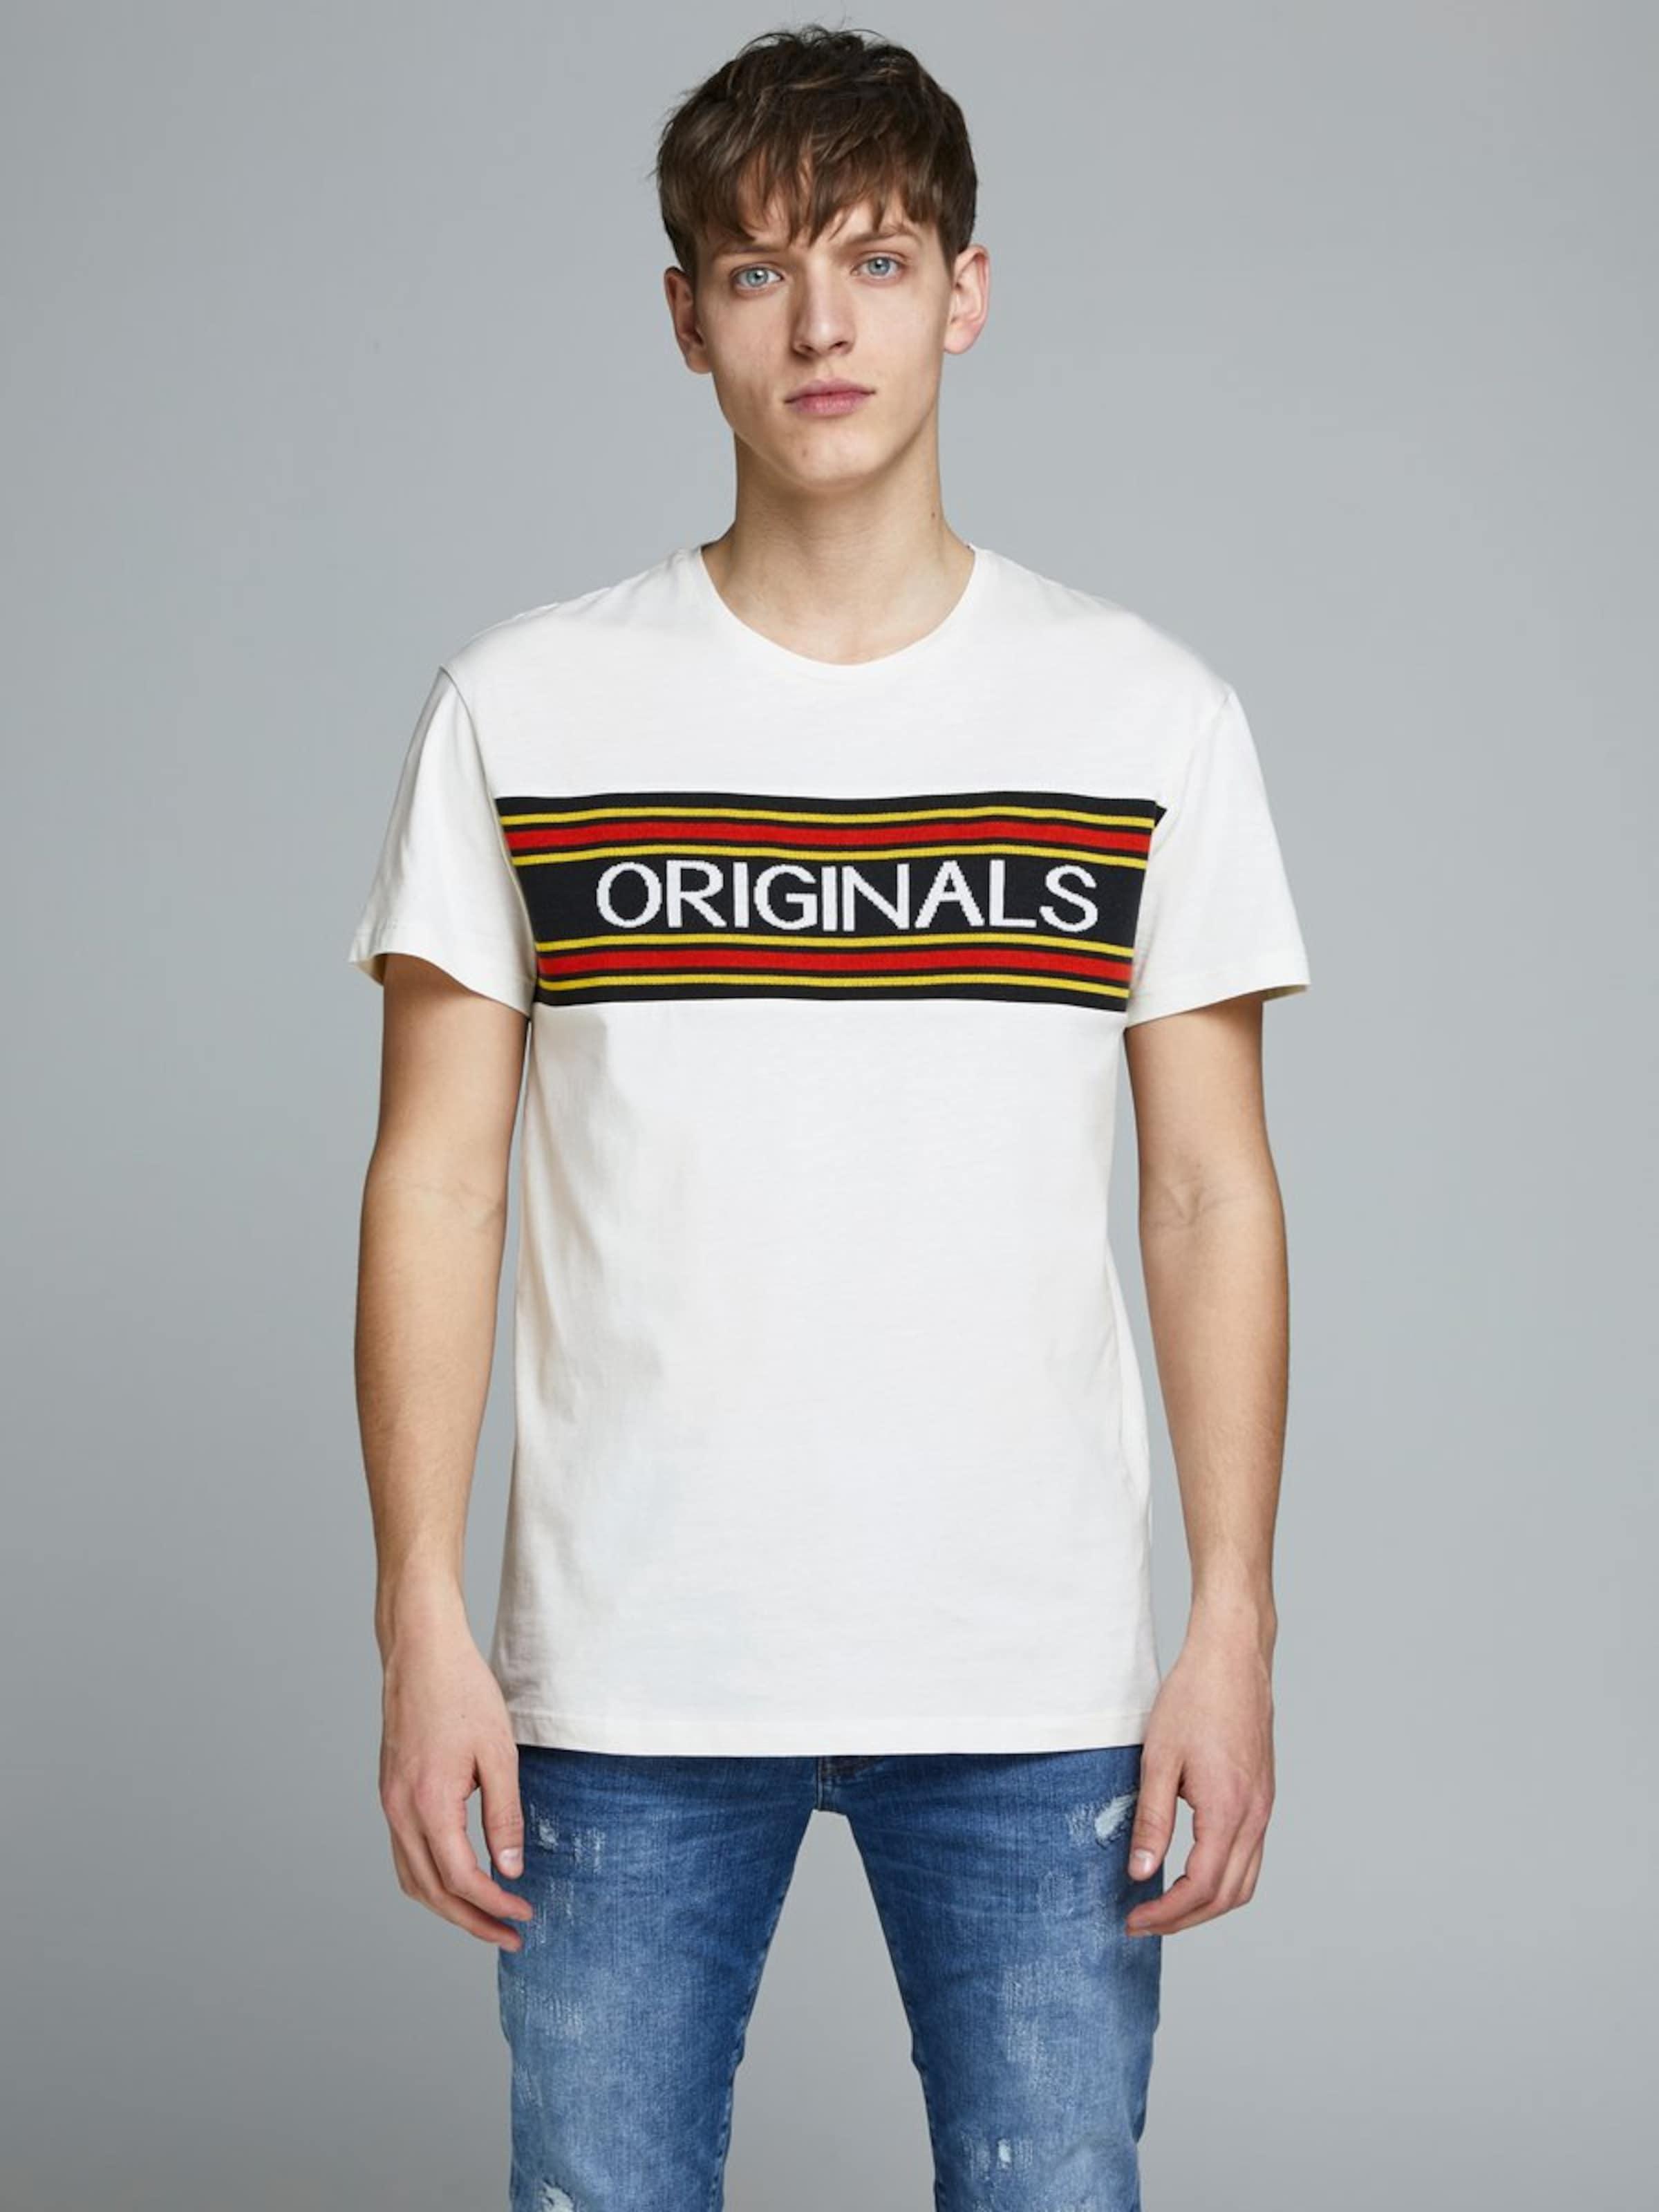 T shirt Jackamp; BleuJaune En Jones CBQderExoW